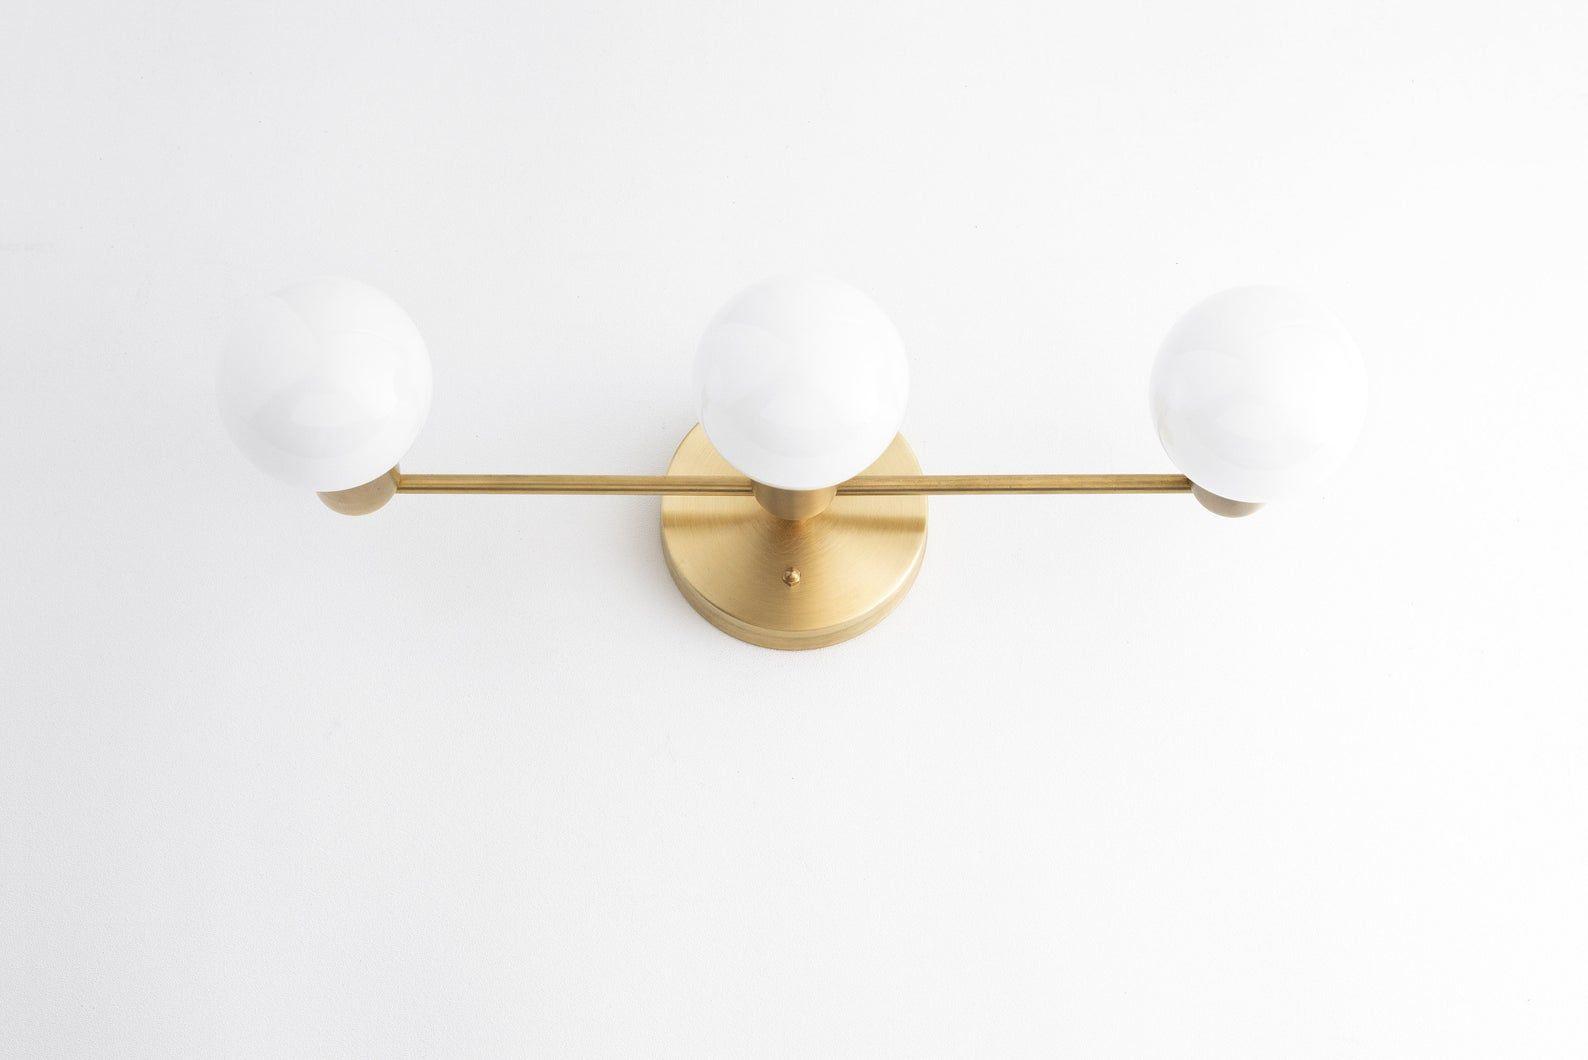 Photo of Bathroom Lighting – Farmhouse Light – Bathroom Vanity – Brass vanity – Brass Light – Vanity Light – Rustic – Retro Light – Model No. 0518